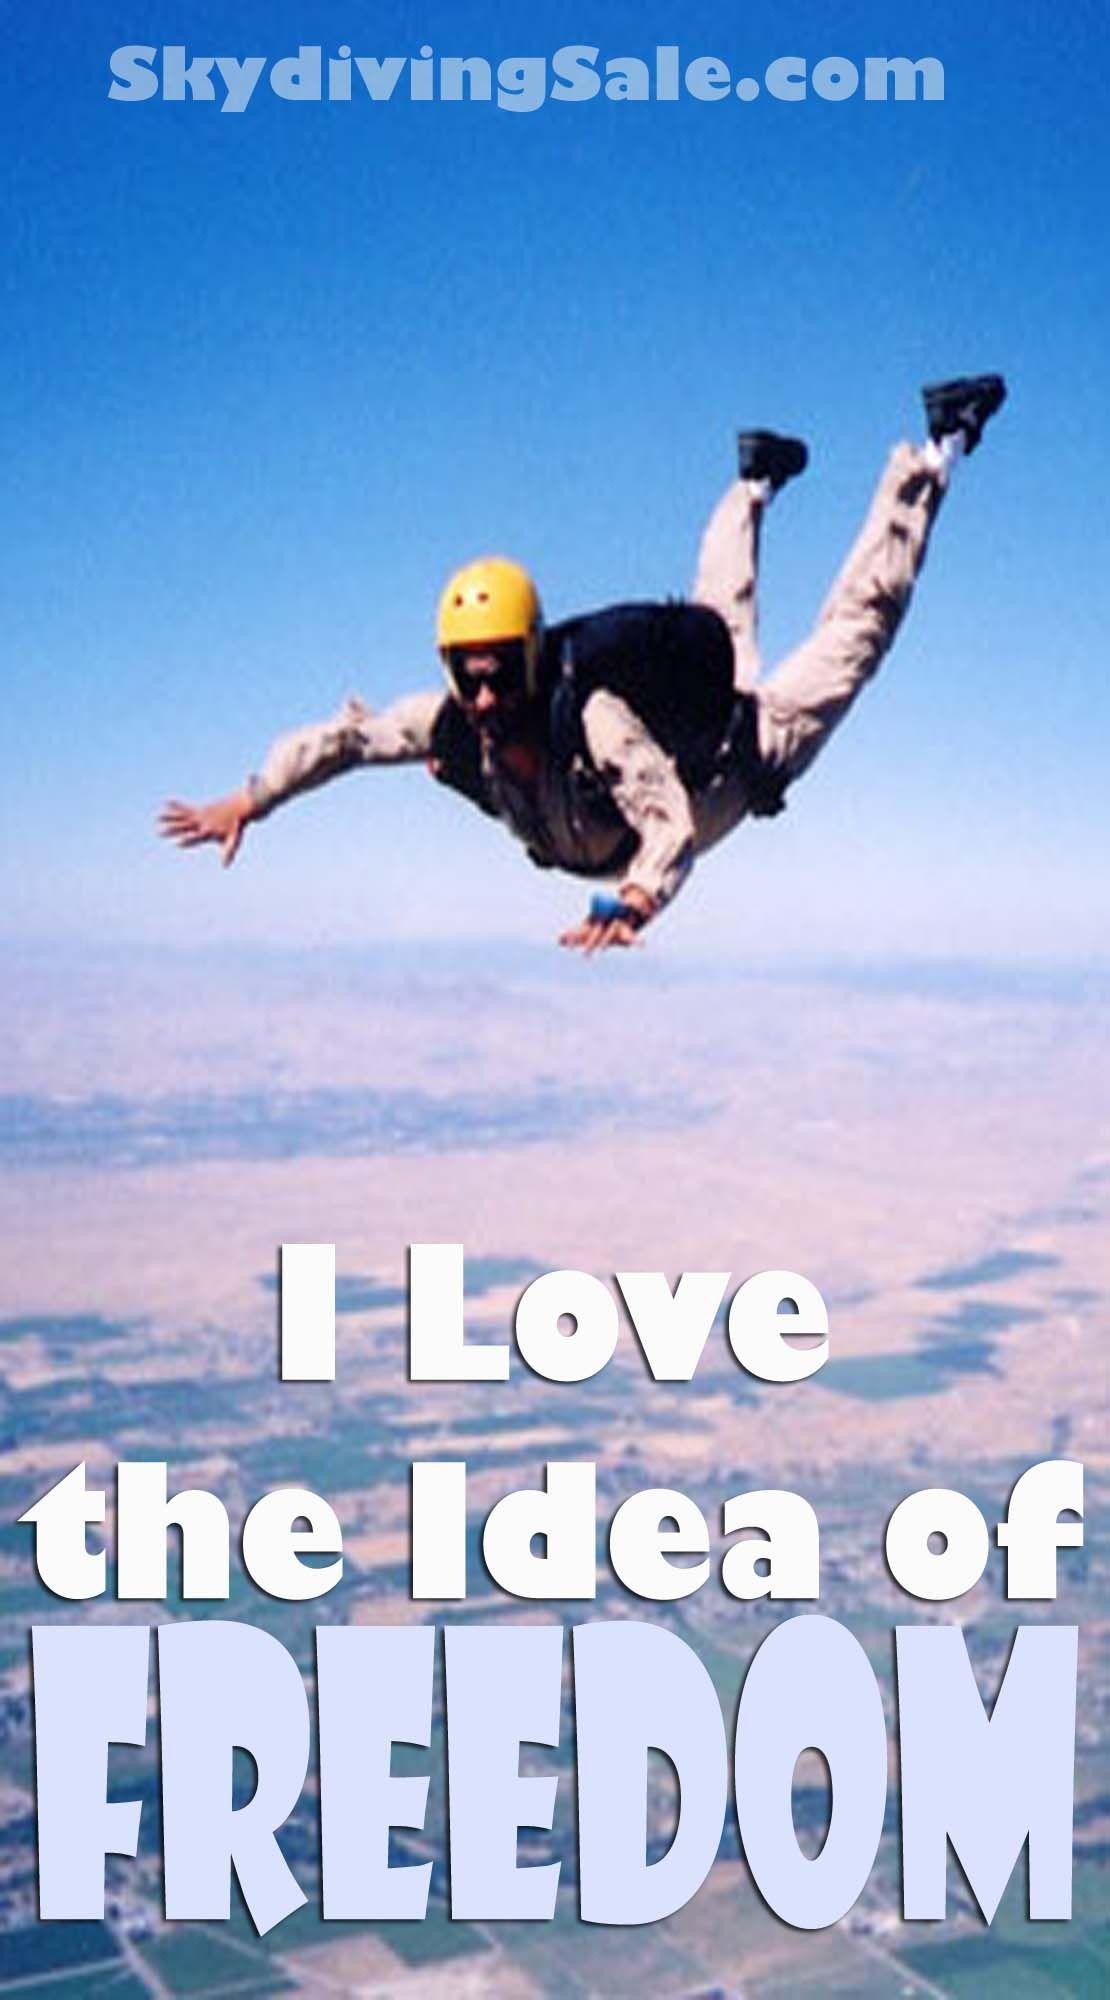 I love the idea of freedom!